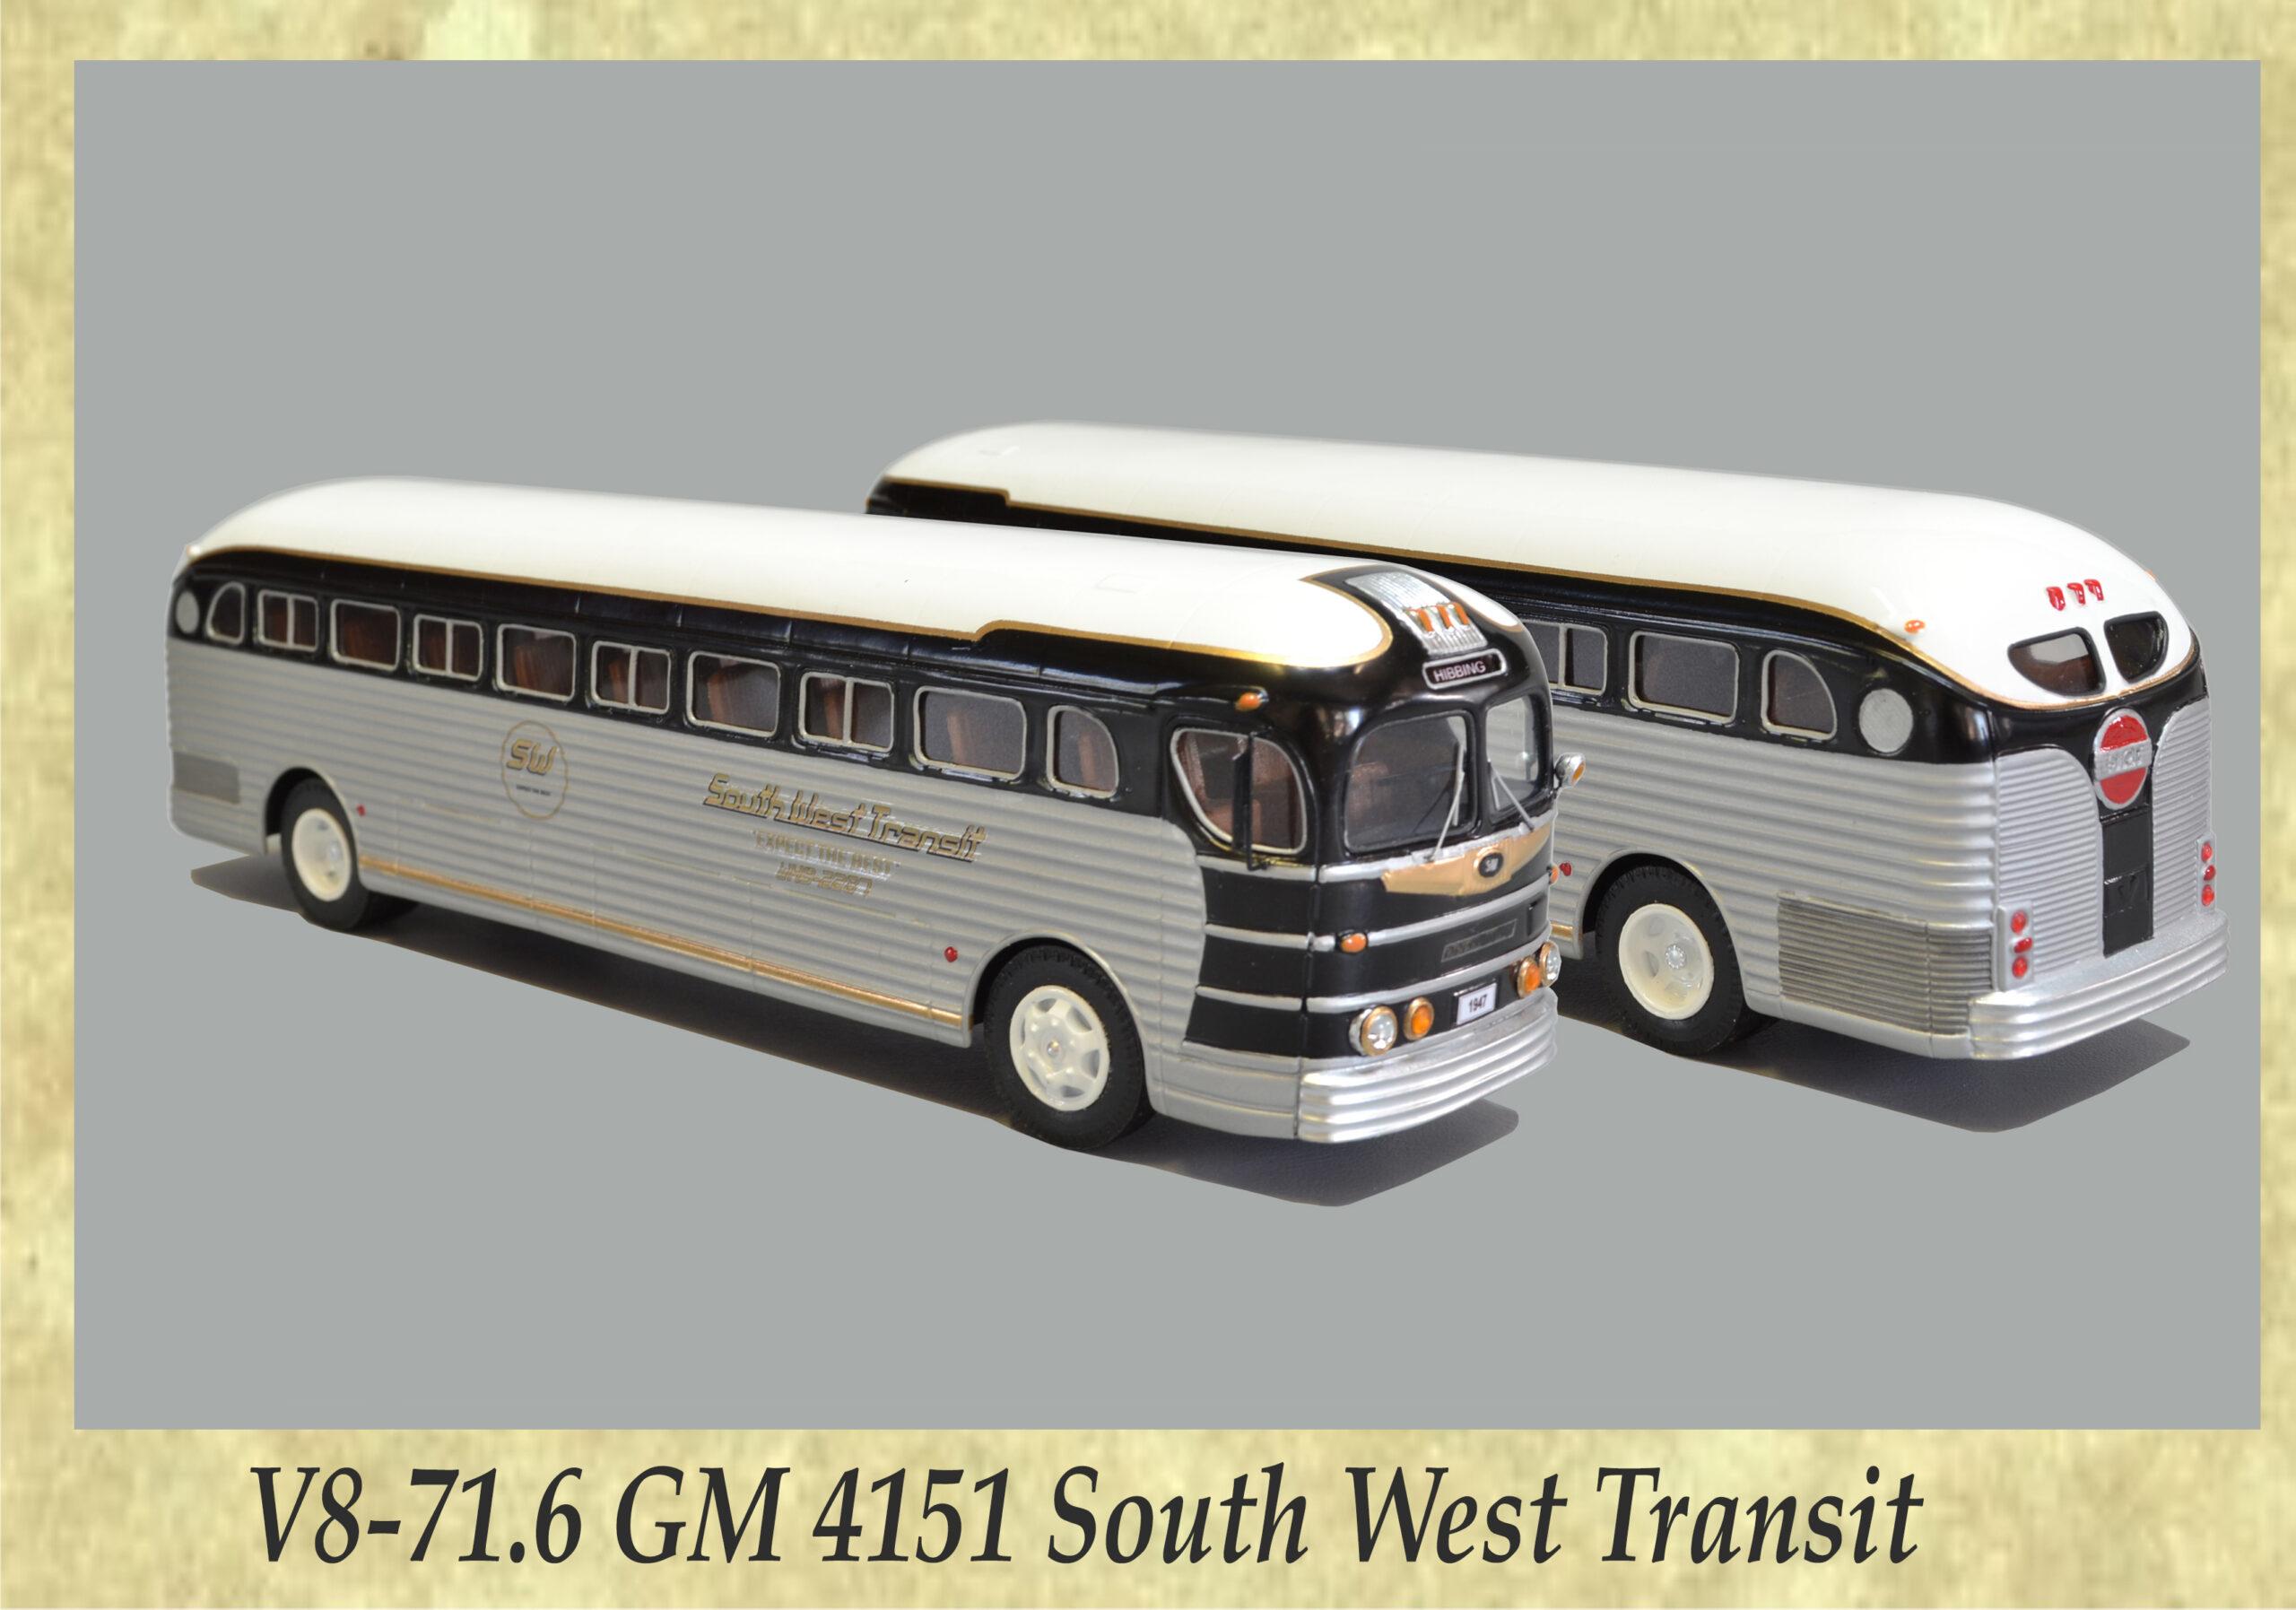 V8-71.6 GM 4151 South West Transit